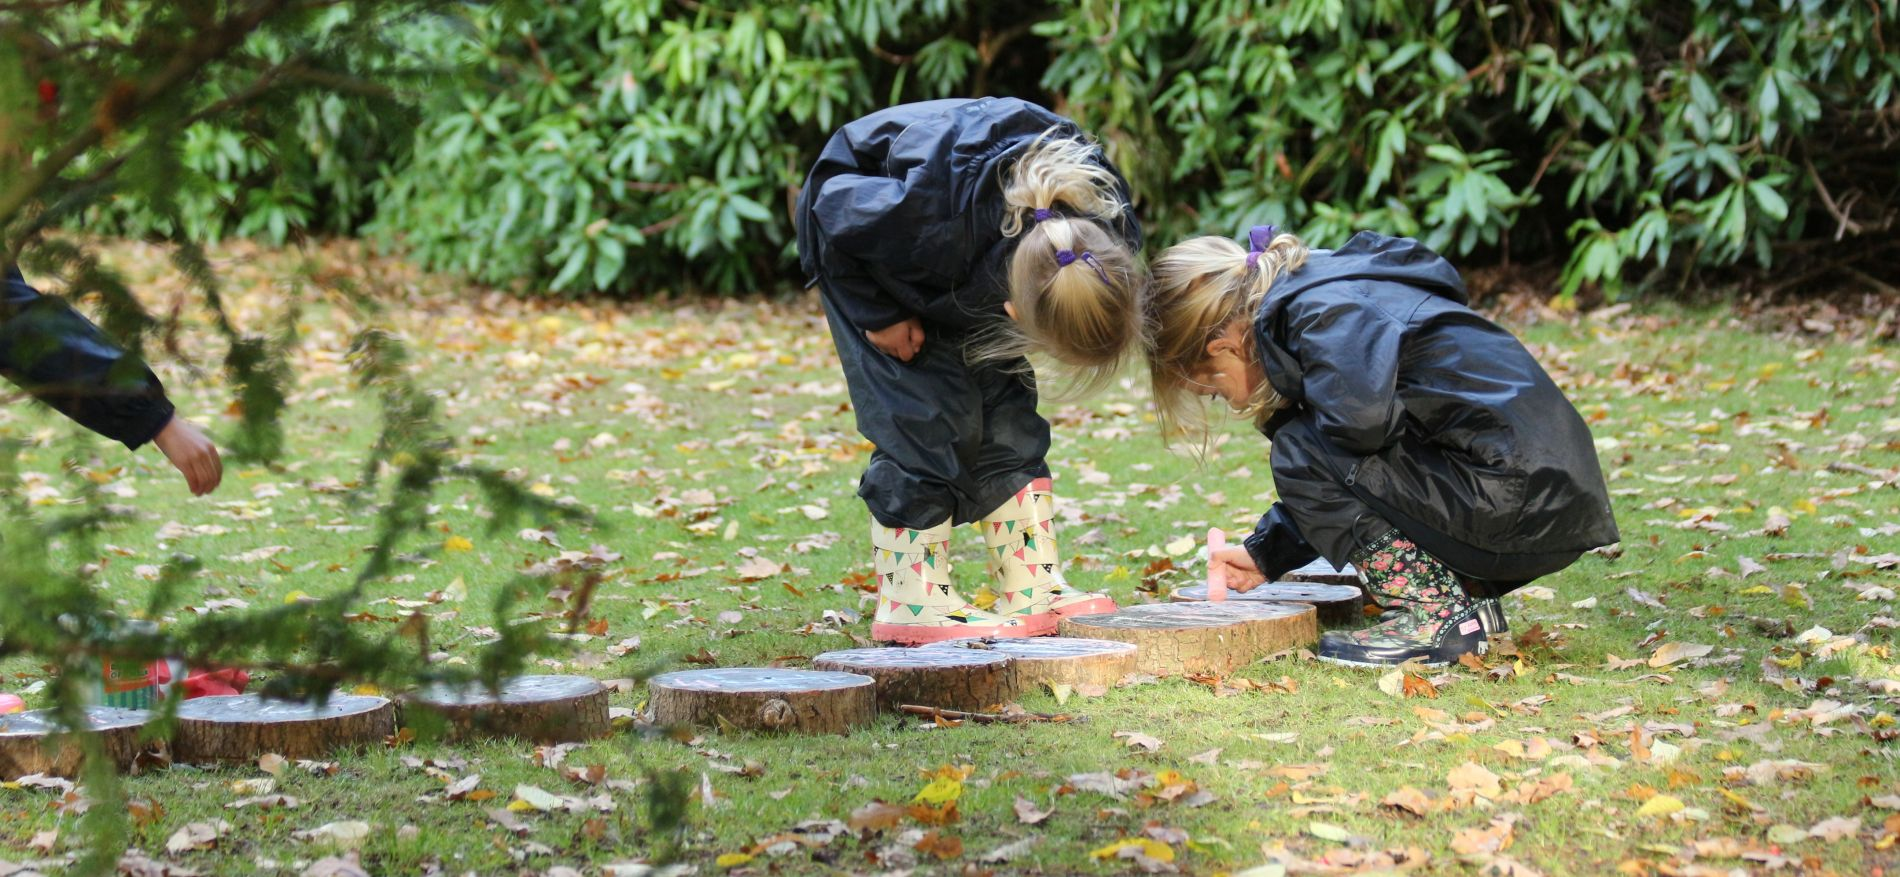 2 schoolgirls using chalk to make creations on tree stumps